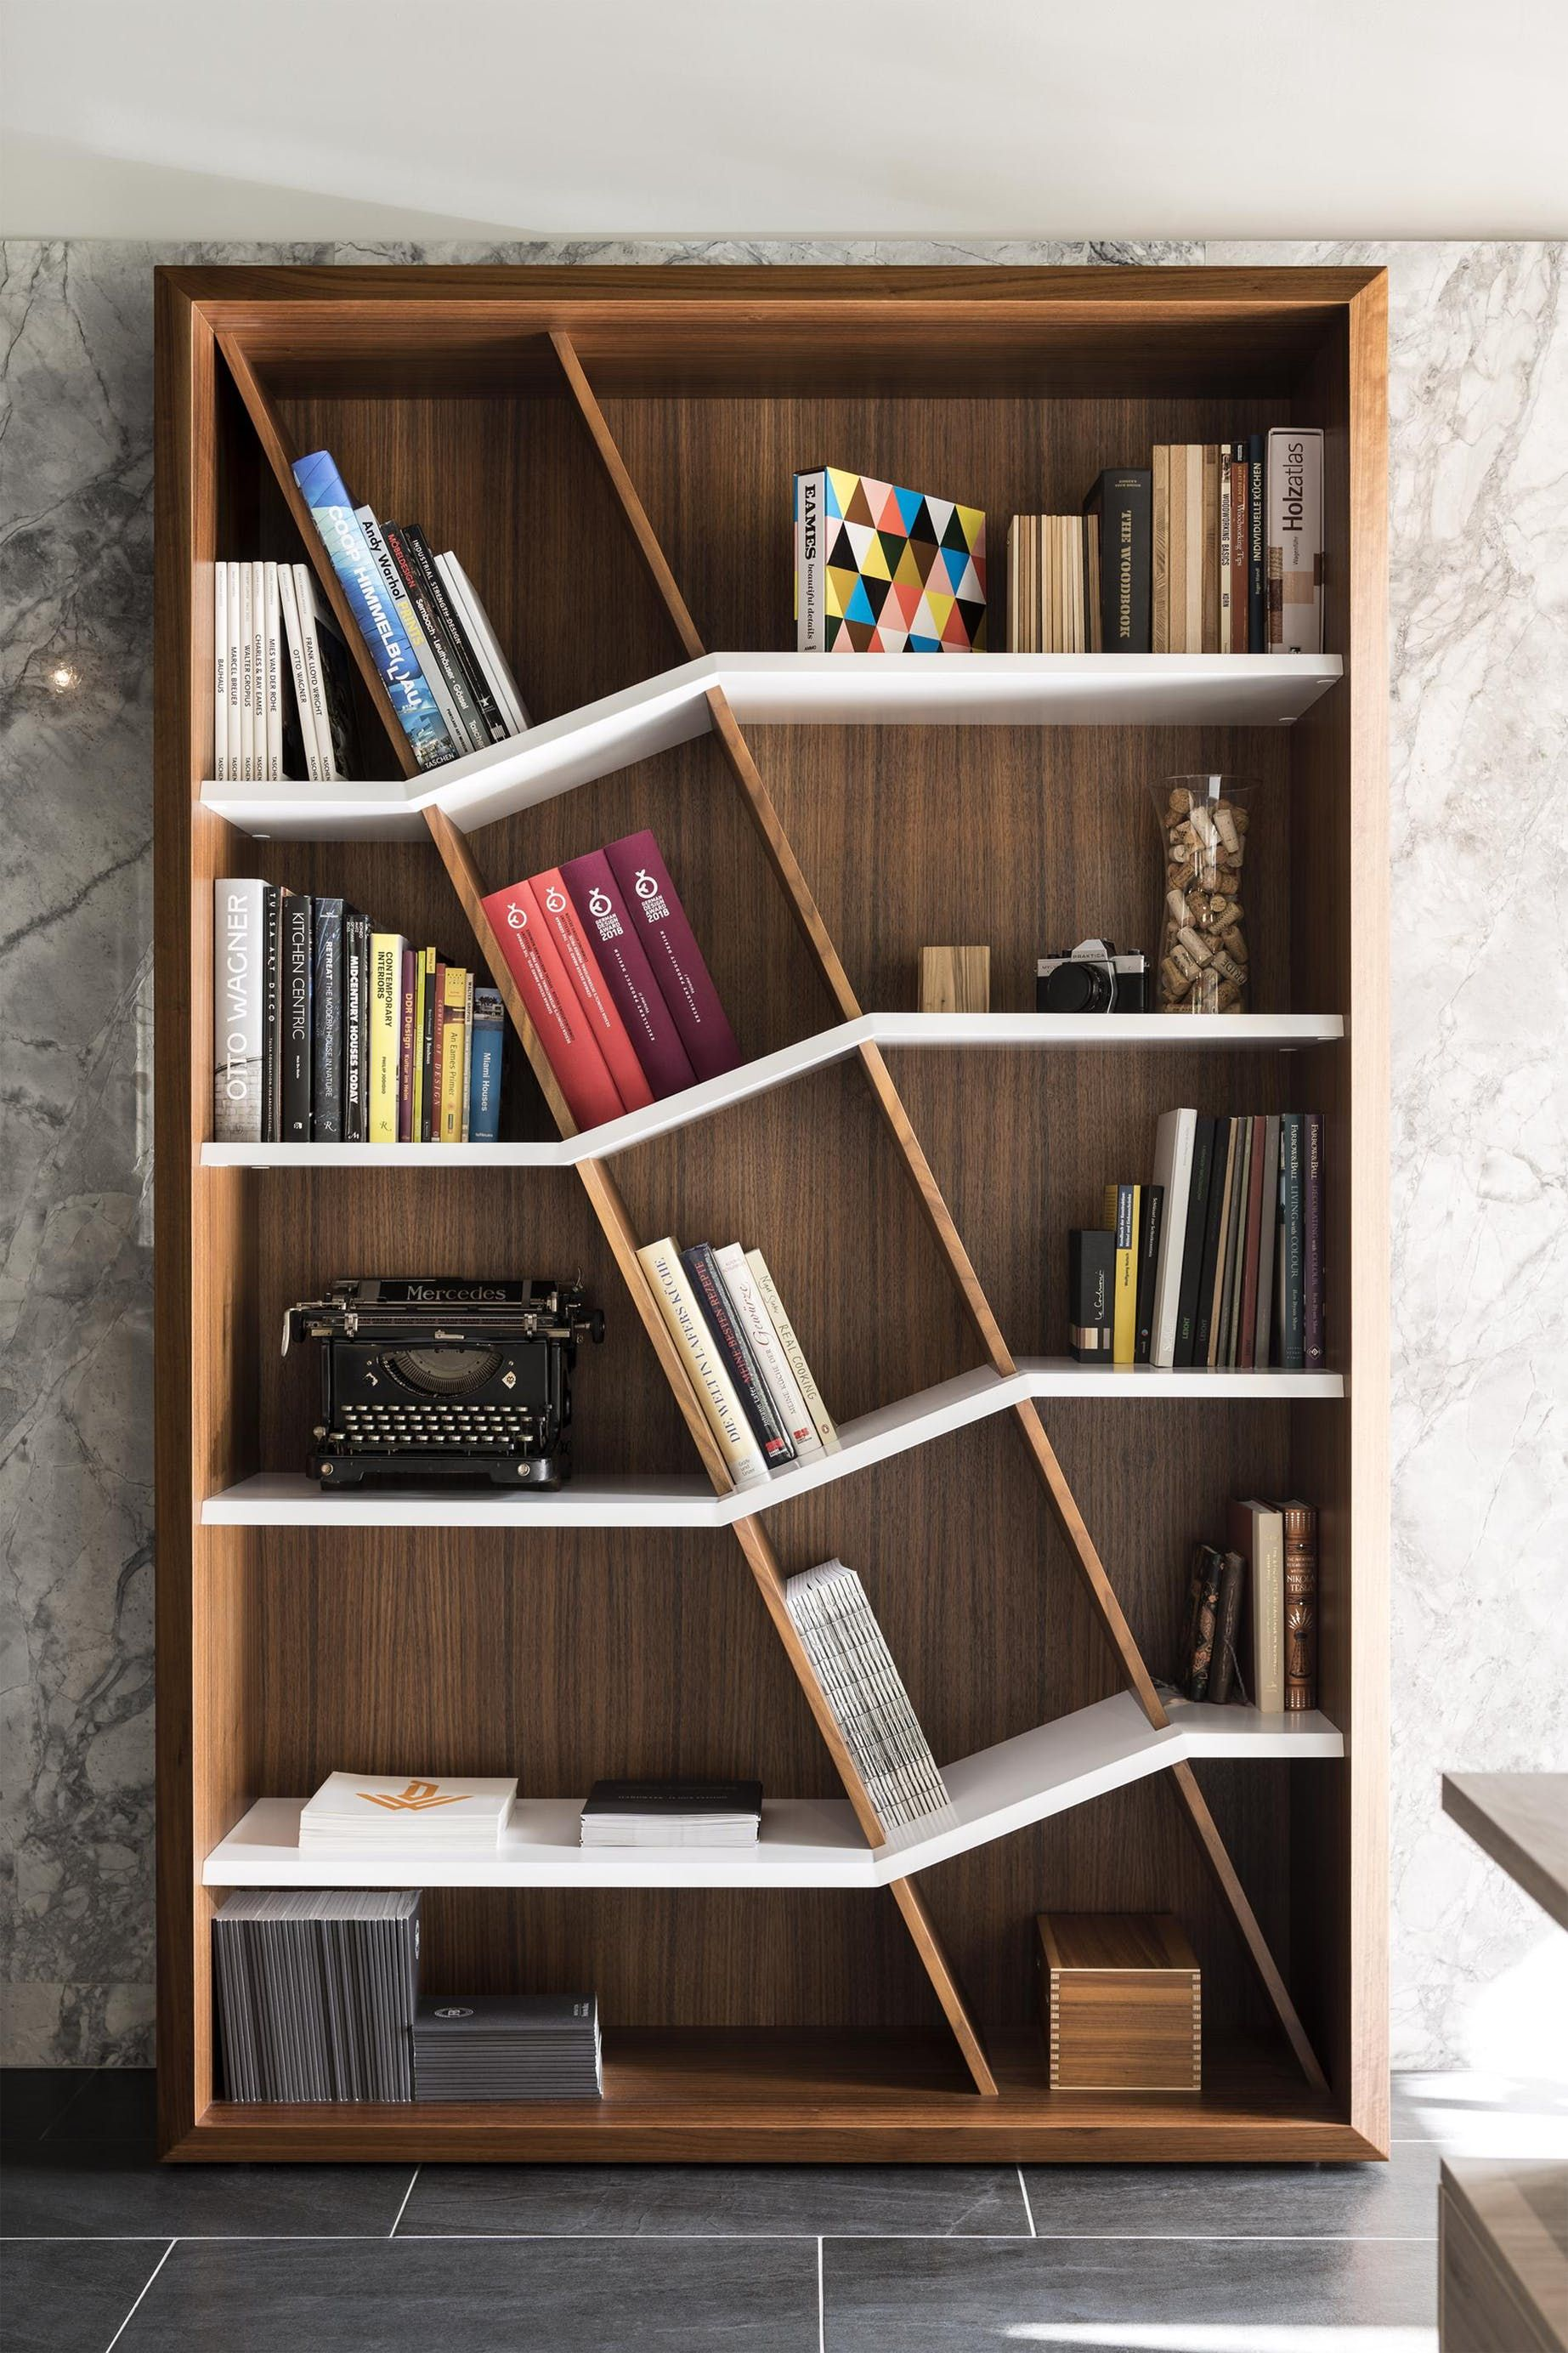 Loculamentum The Revival Of The Classic Bookcase Schwarzmann Llc Archinect En 2020 Muebles Para Libros Decoracion Biblioteca En Casa Diseno De Estanteria